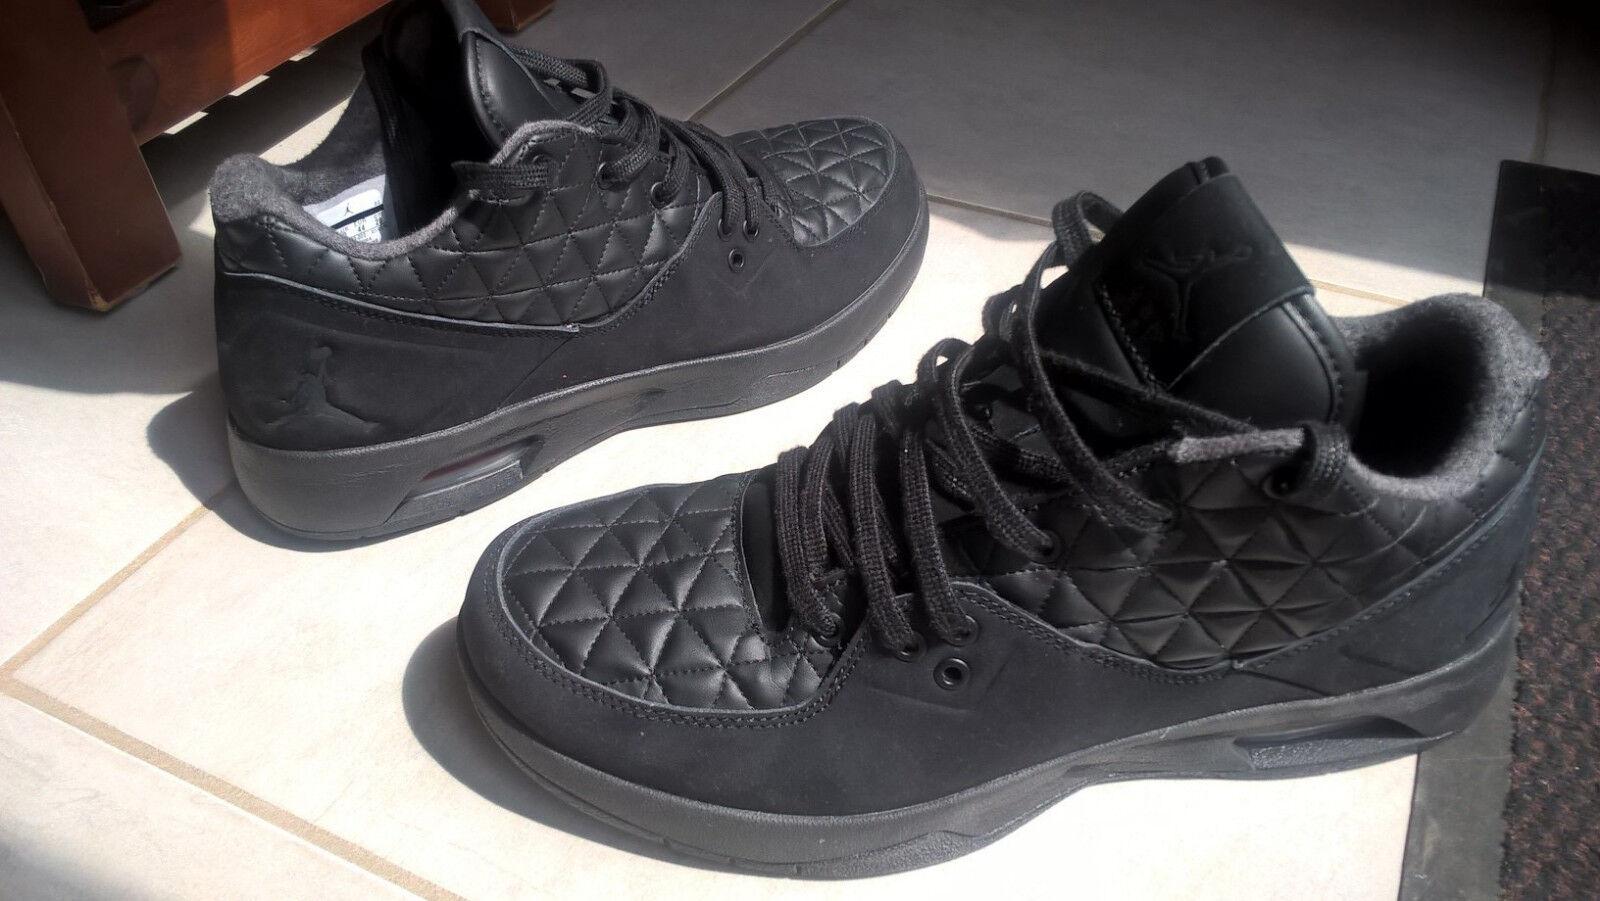 Air Jordan Clutch EUR44 ou 43 US9.5/10 UK8.5/9 retro legend M Nike NBA max XVIII M legend c698ef